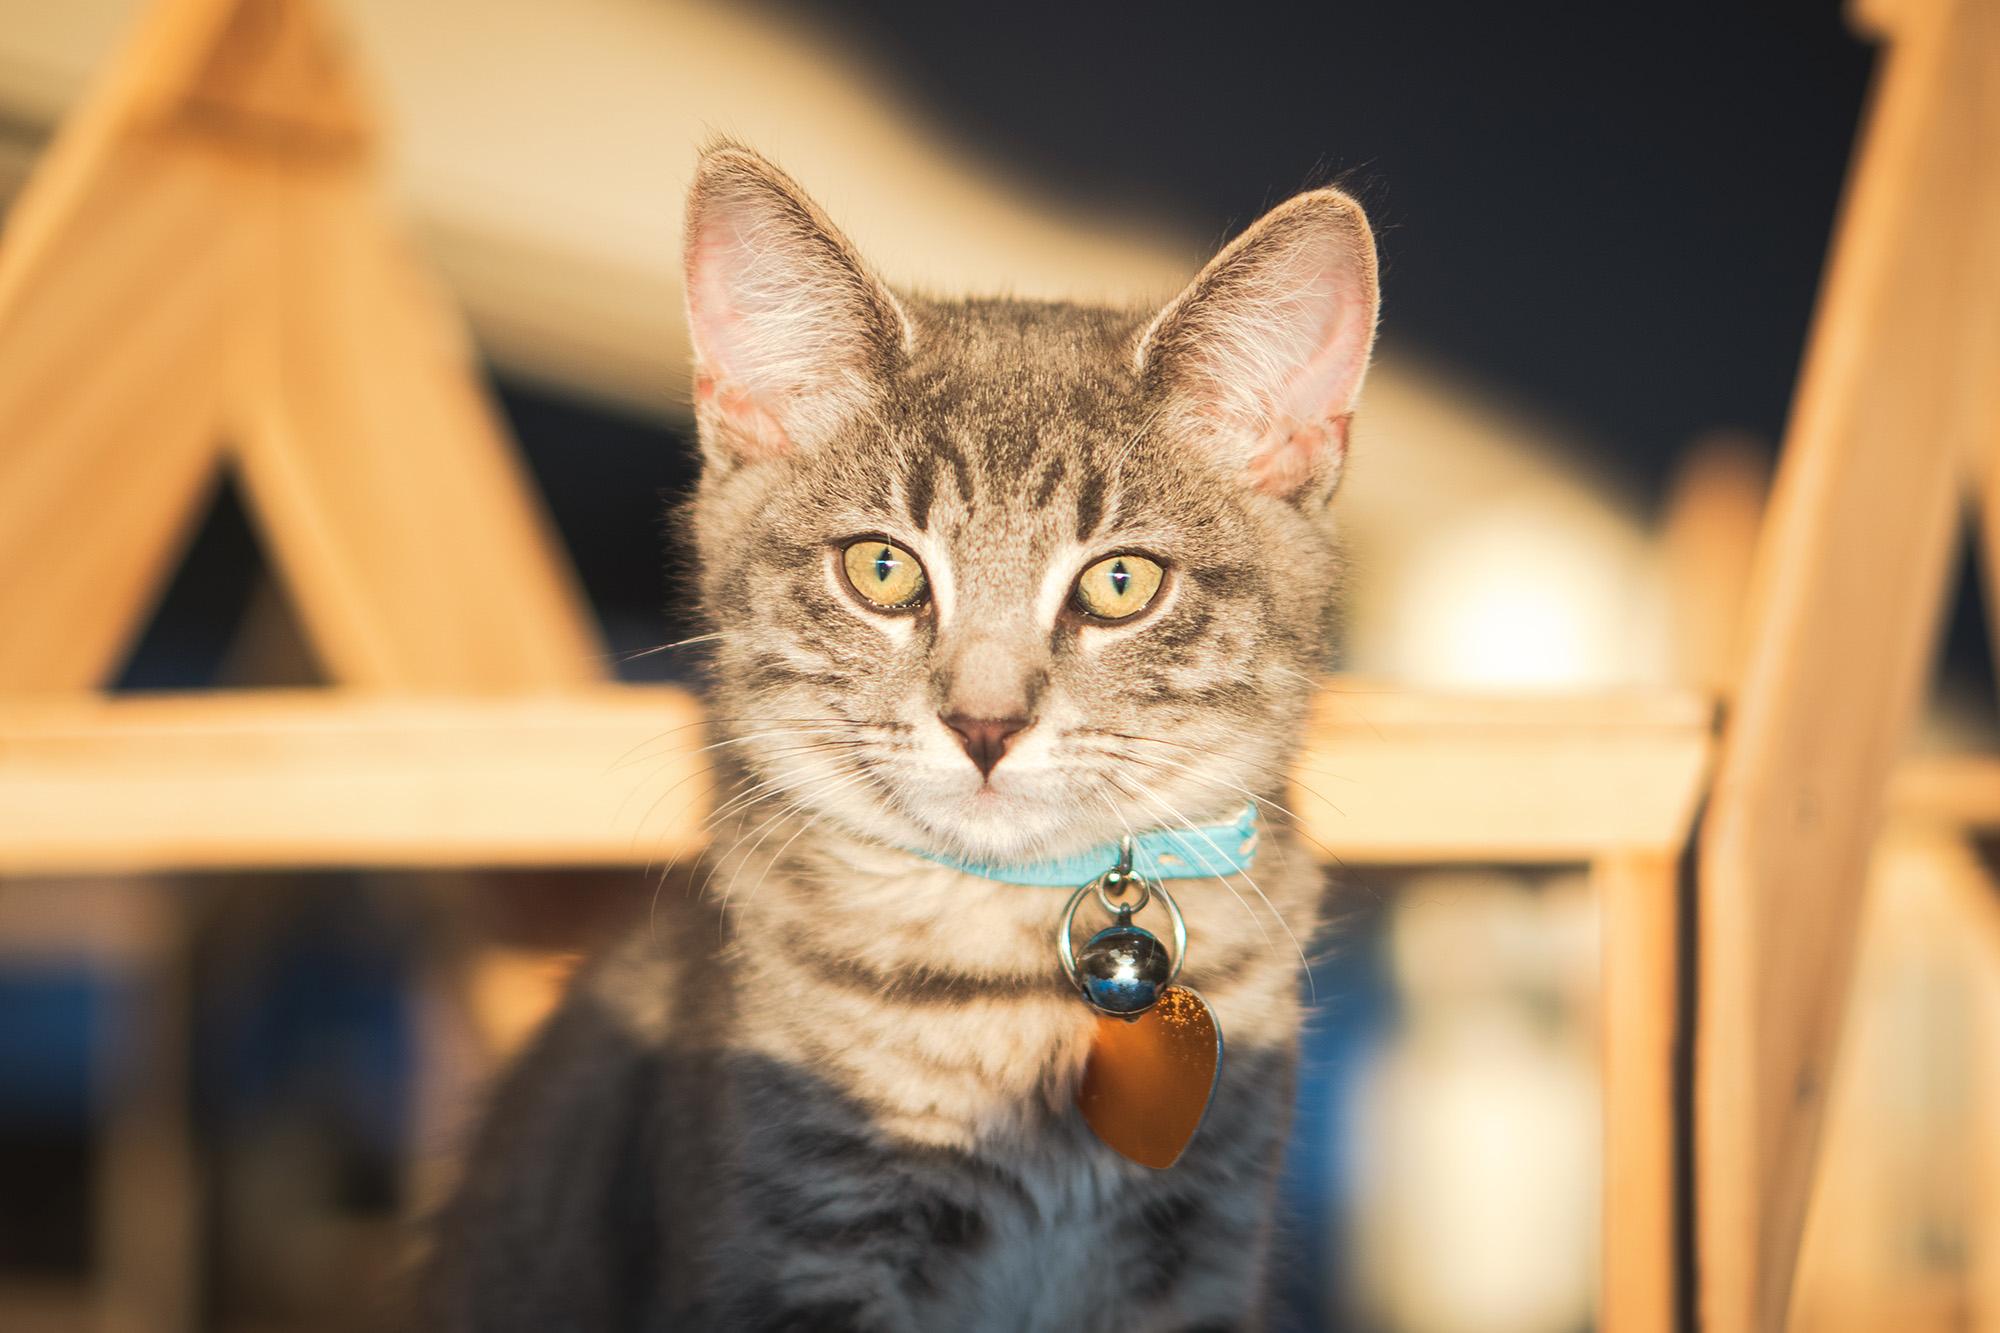 Jasper - Adopted 19/3/19